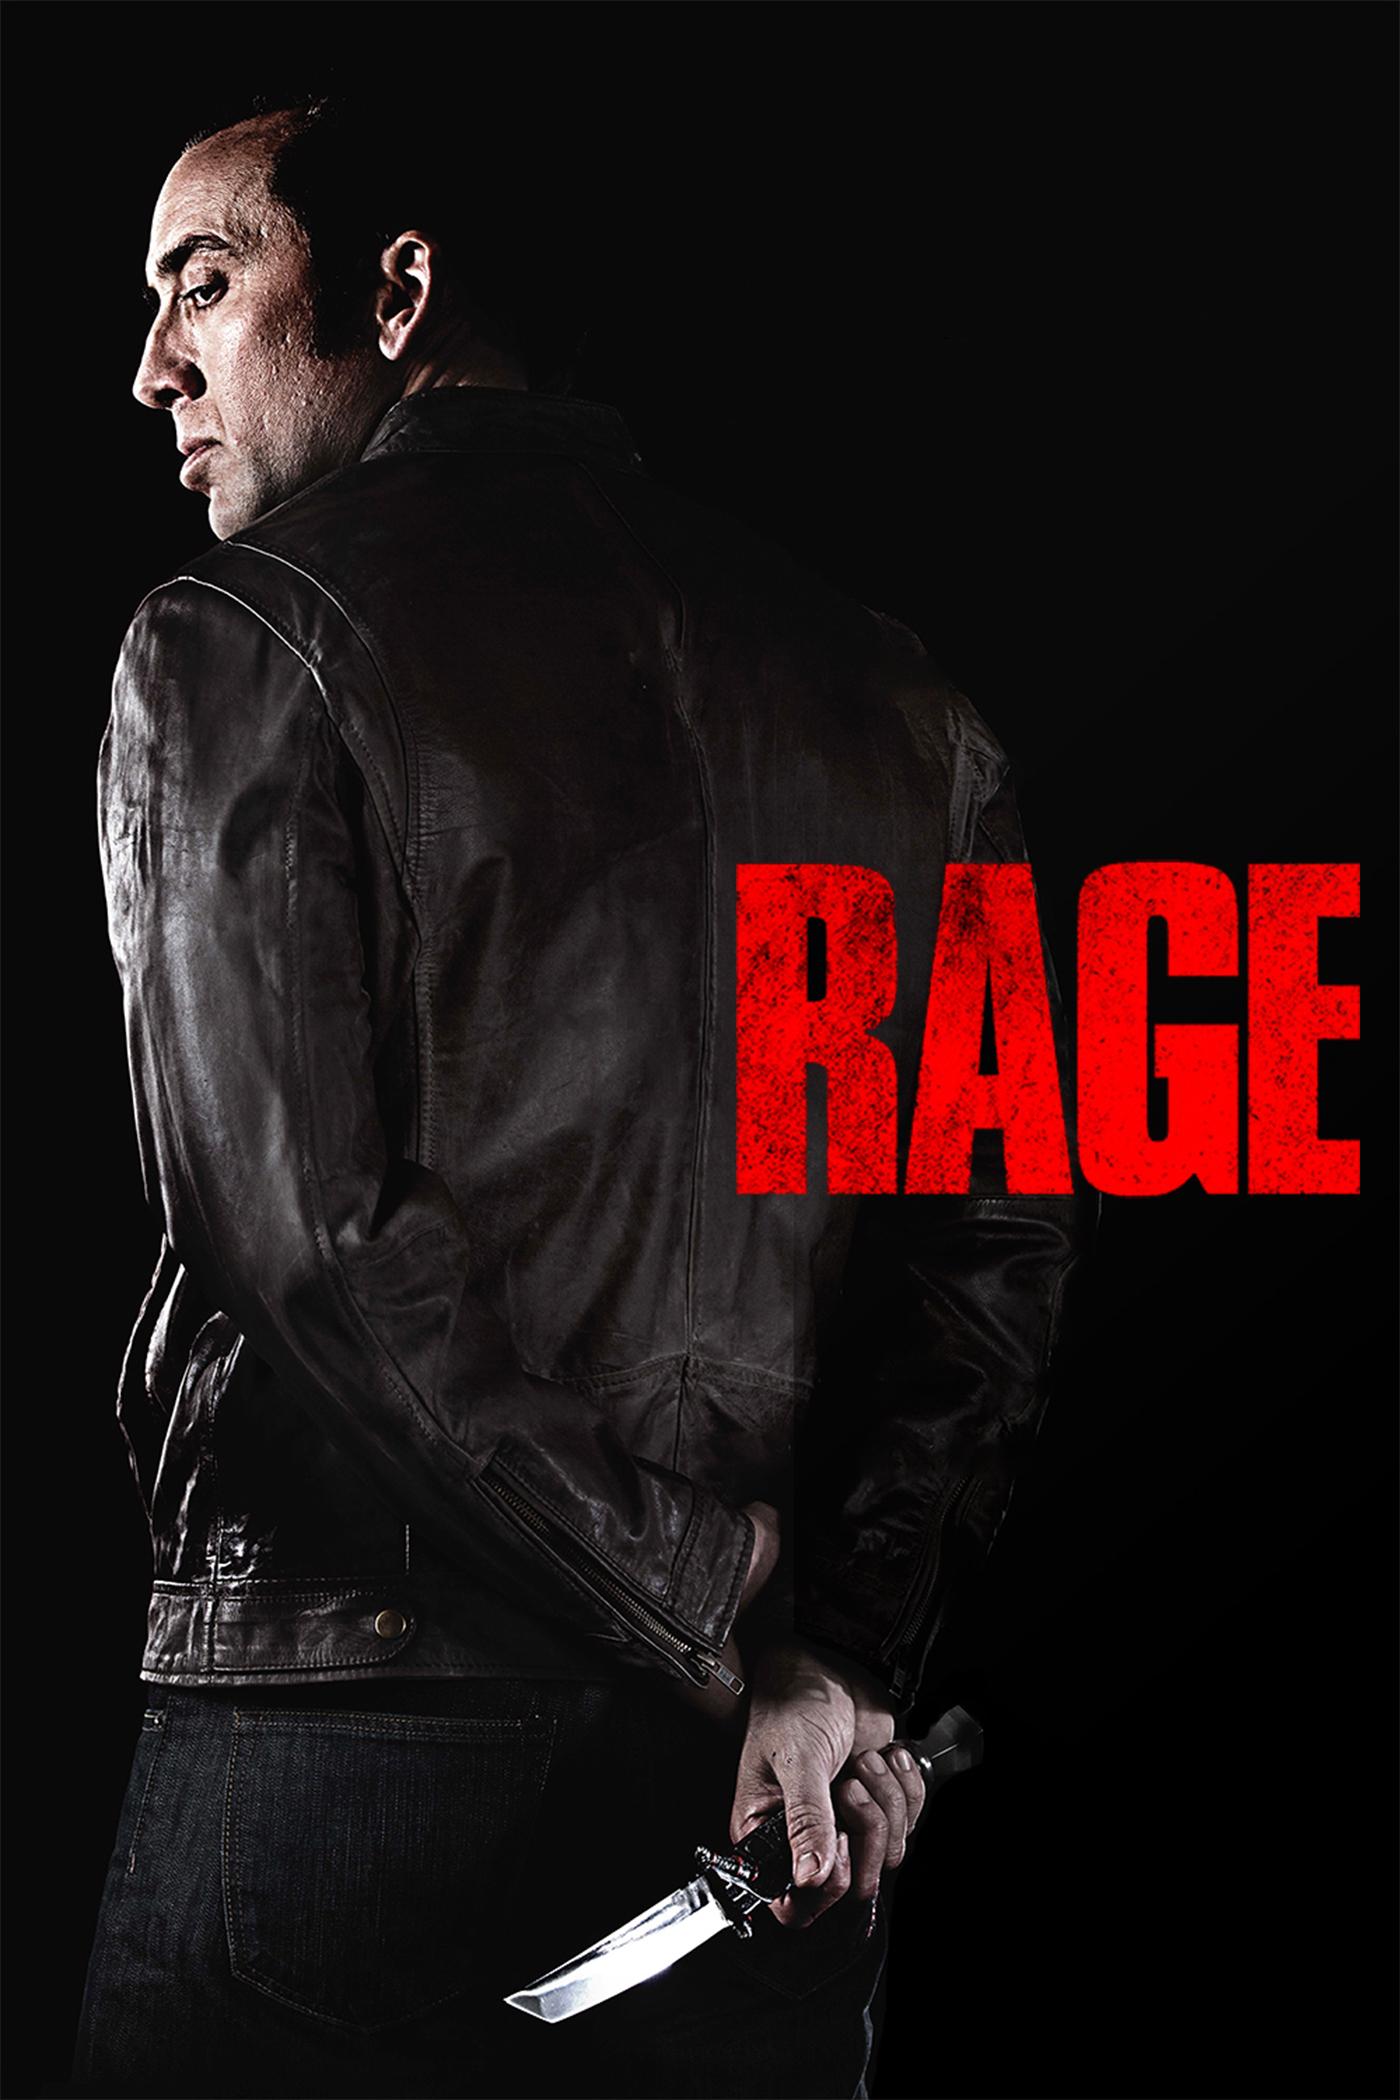 Rage (aka Tokarev) – Mildly interesting movie with a lousy ending